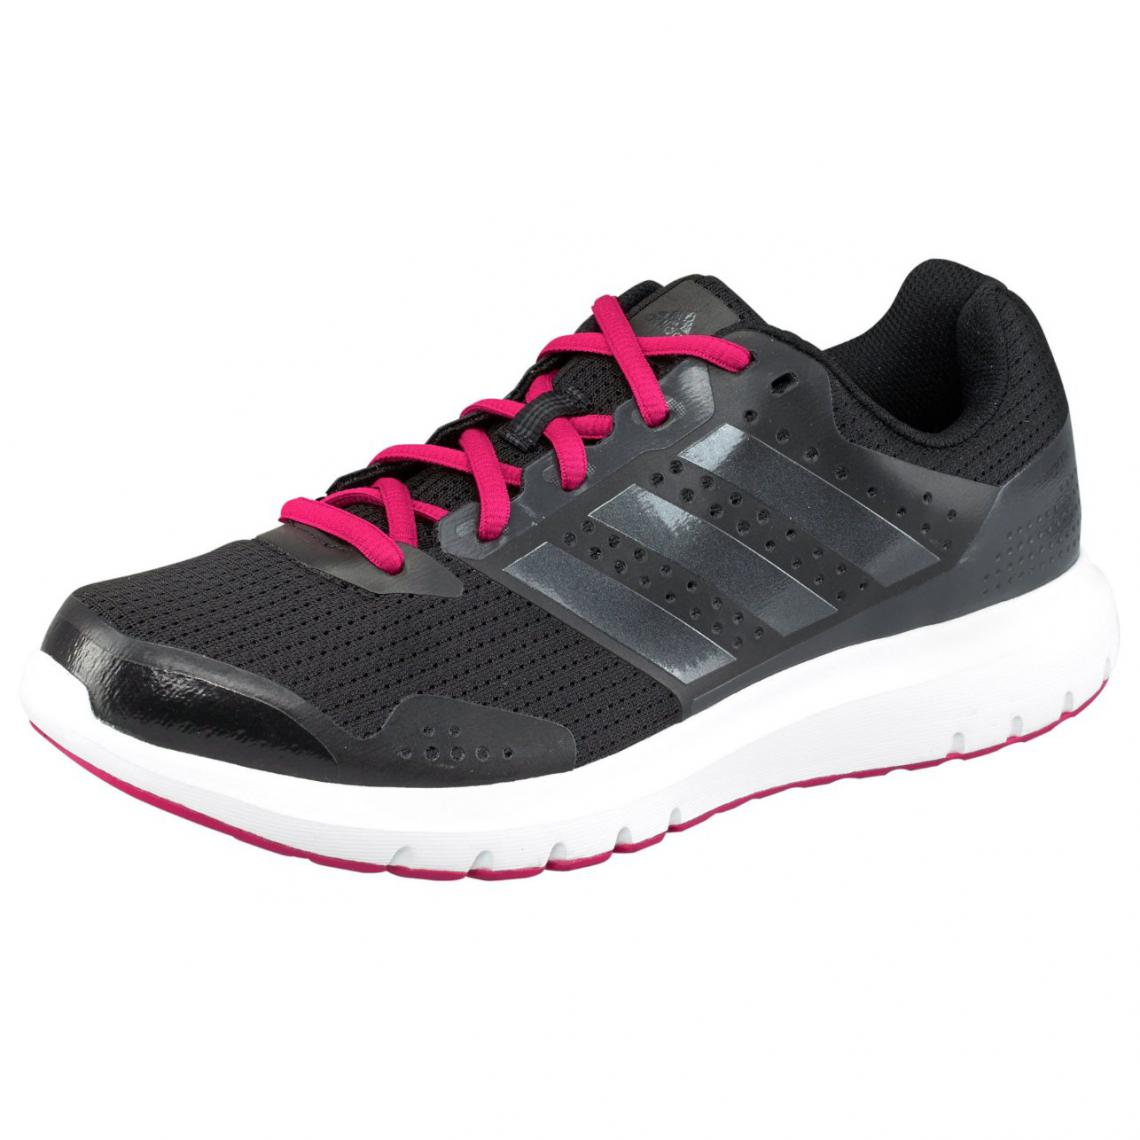 grossiste 2e72b 3c2c8 adidas Performance Duramo 7 W chaussure de course à pied à ...